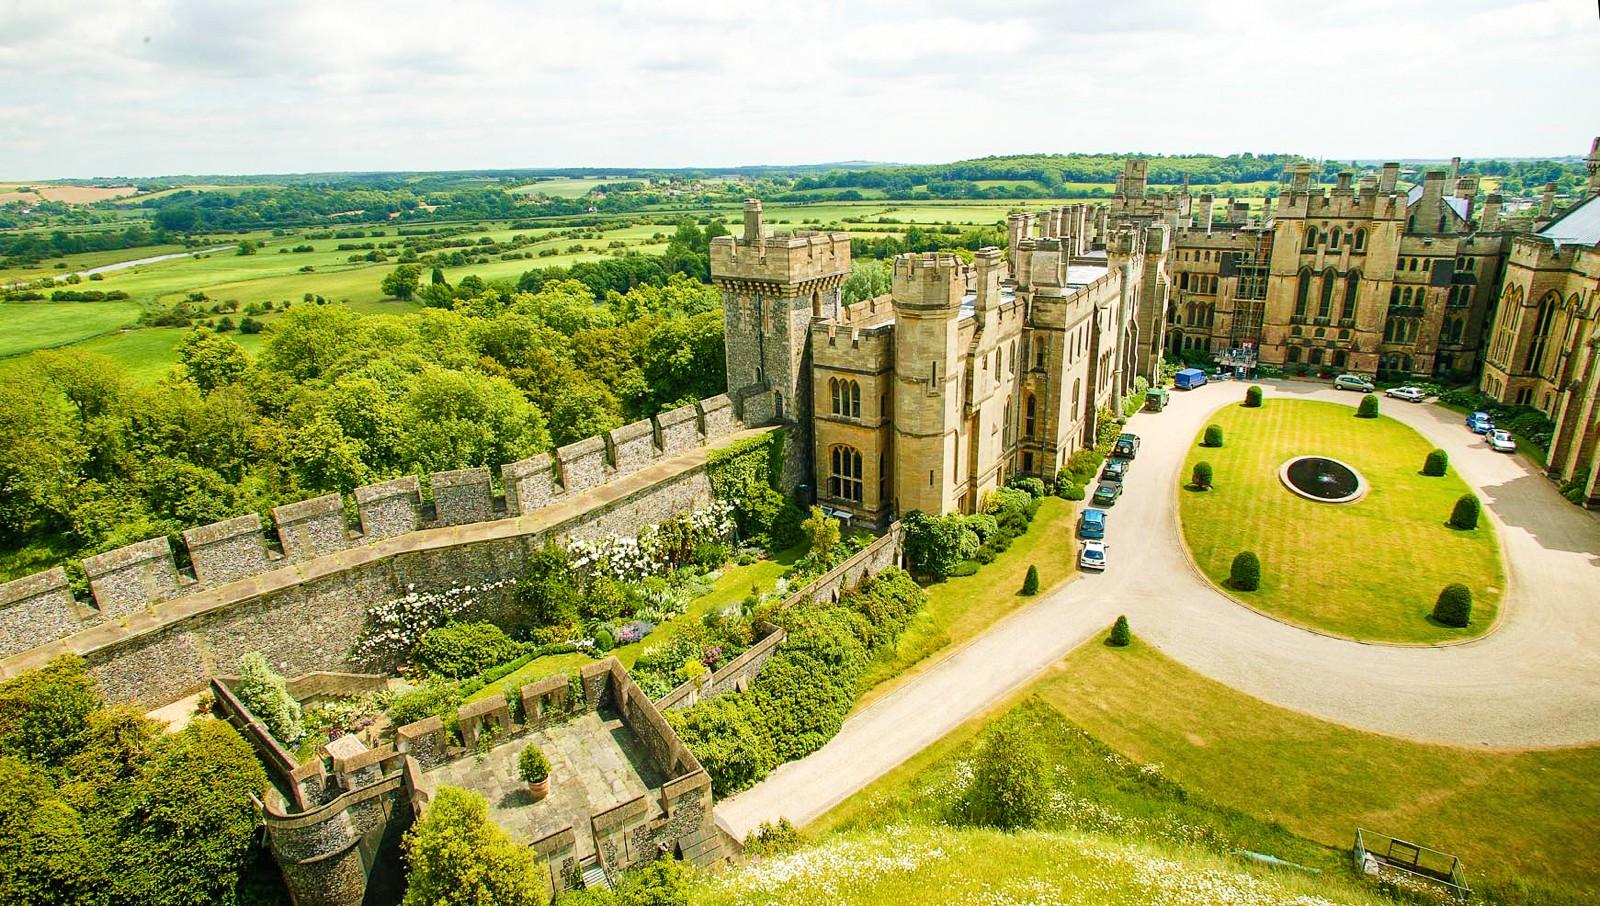 fairytale-castles-in-England_-2